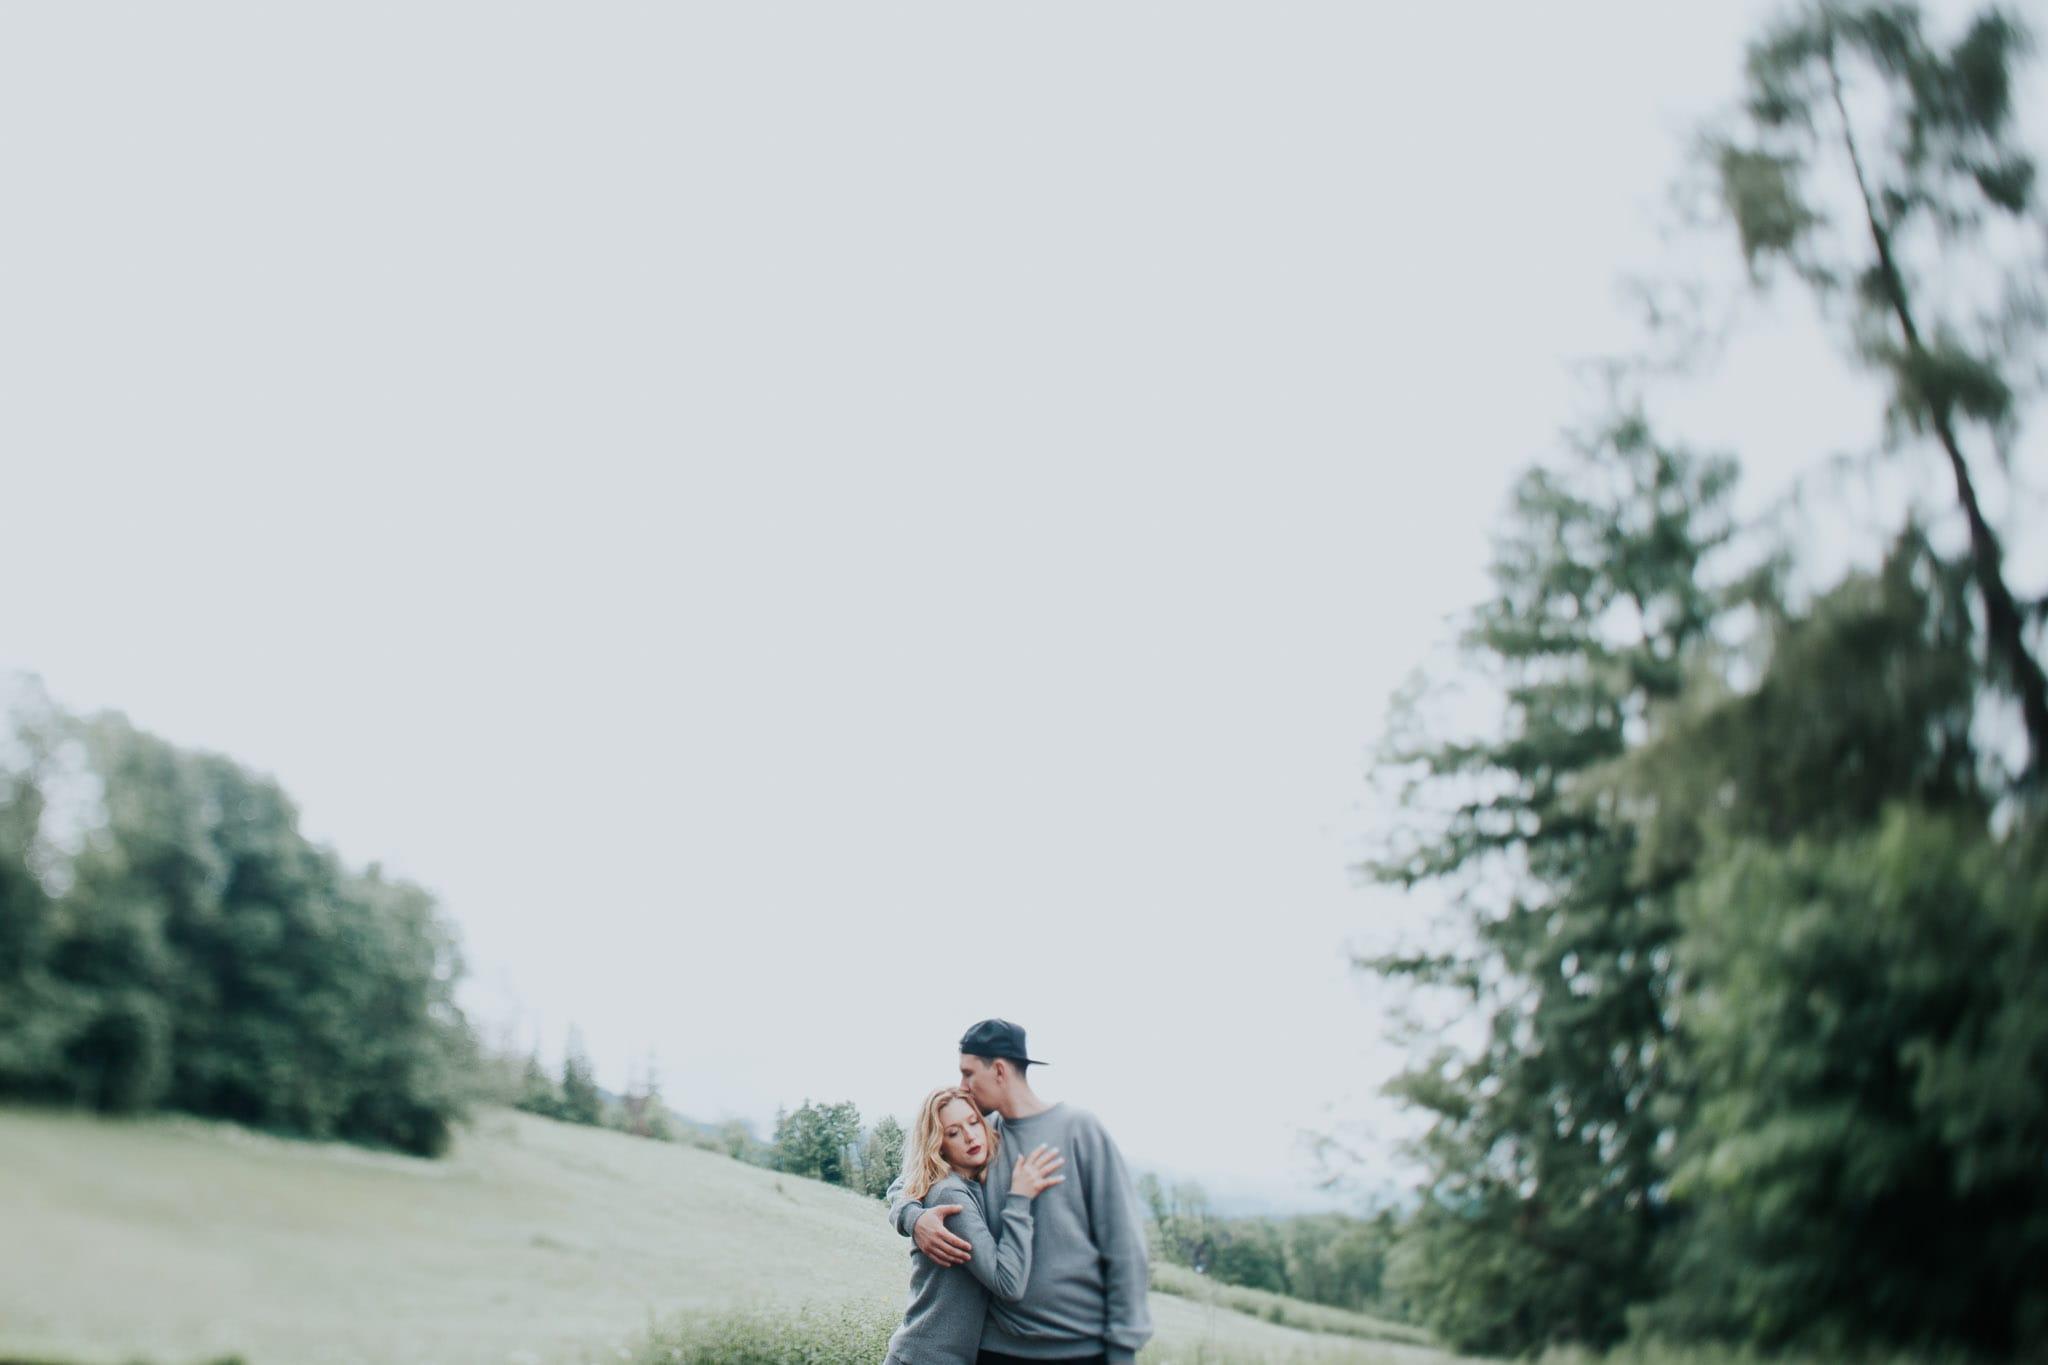 sesja narzeczenska zakopane maciej sobol fotograf slubny krakow 7535 - Sylwia & Dominik – [Villa 11, Zakopane]